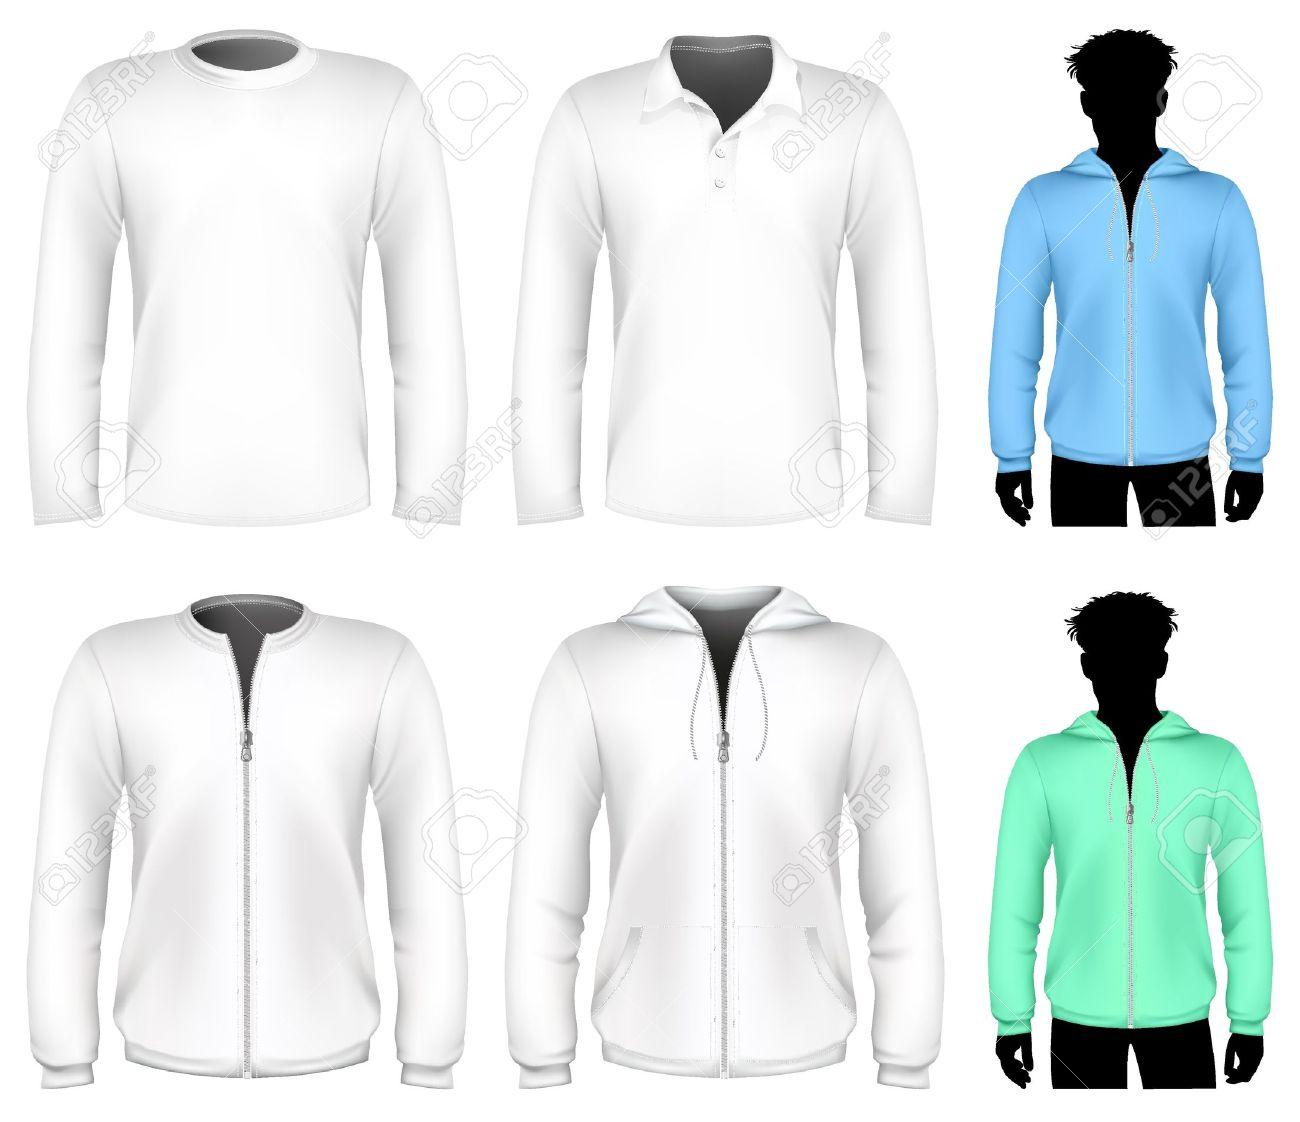 Shirt hoodie design - Vector T Shirt Polo Shirt And Sweatshirt Design Template Long Sleeve Stock